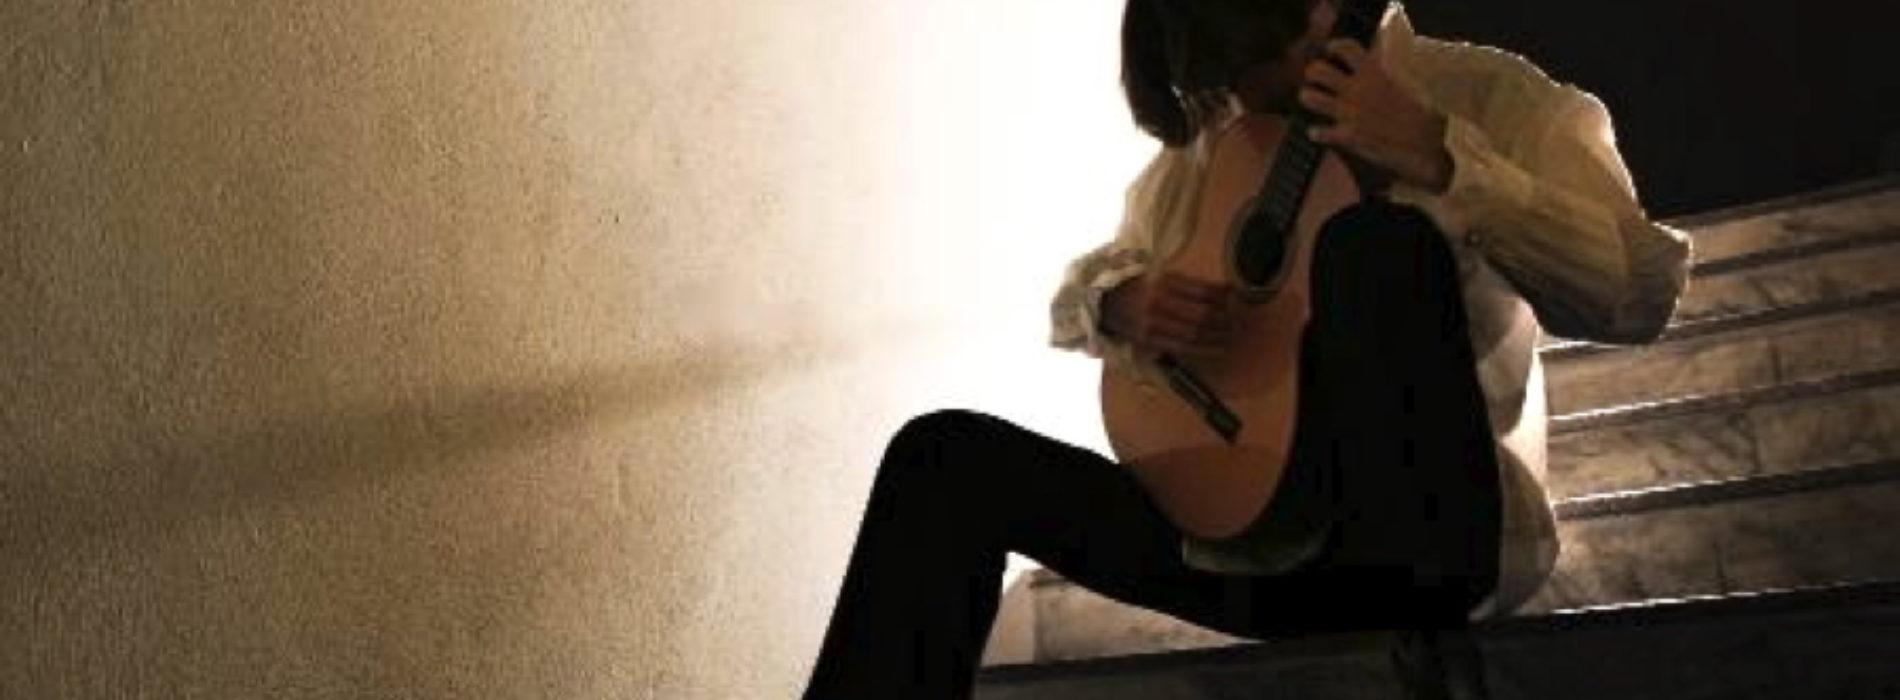 Classical Guitar Concert Set for Oct. 6